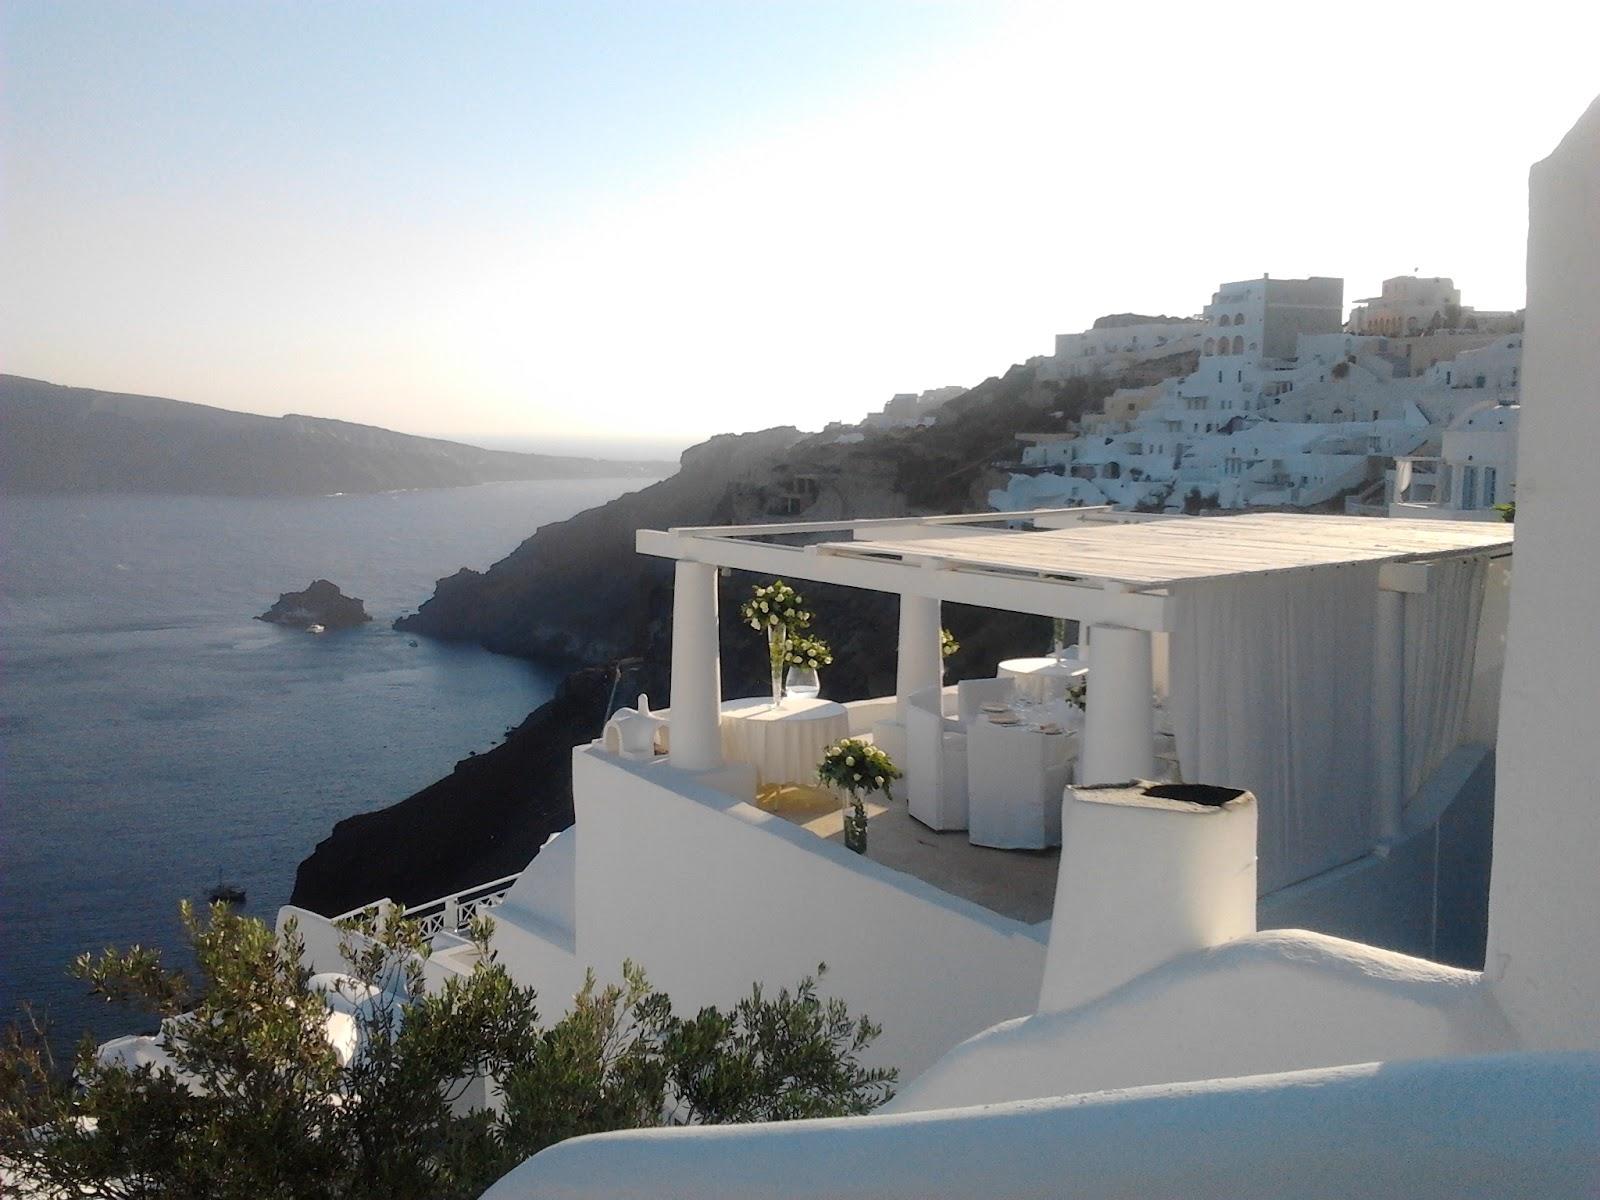 Wedding in Santorini: find the perfect wedding location ...